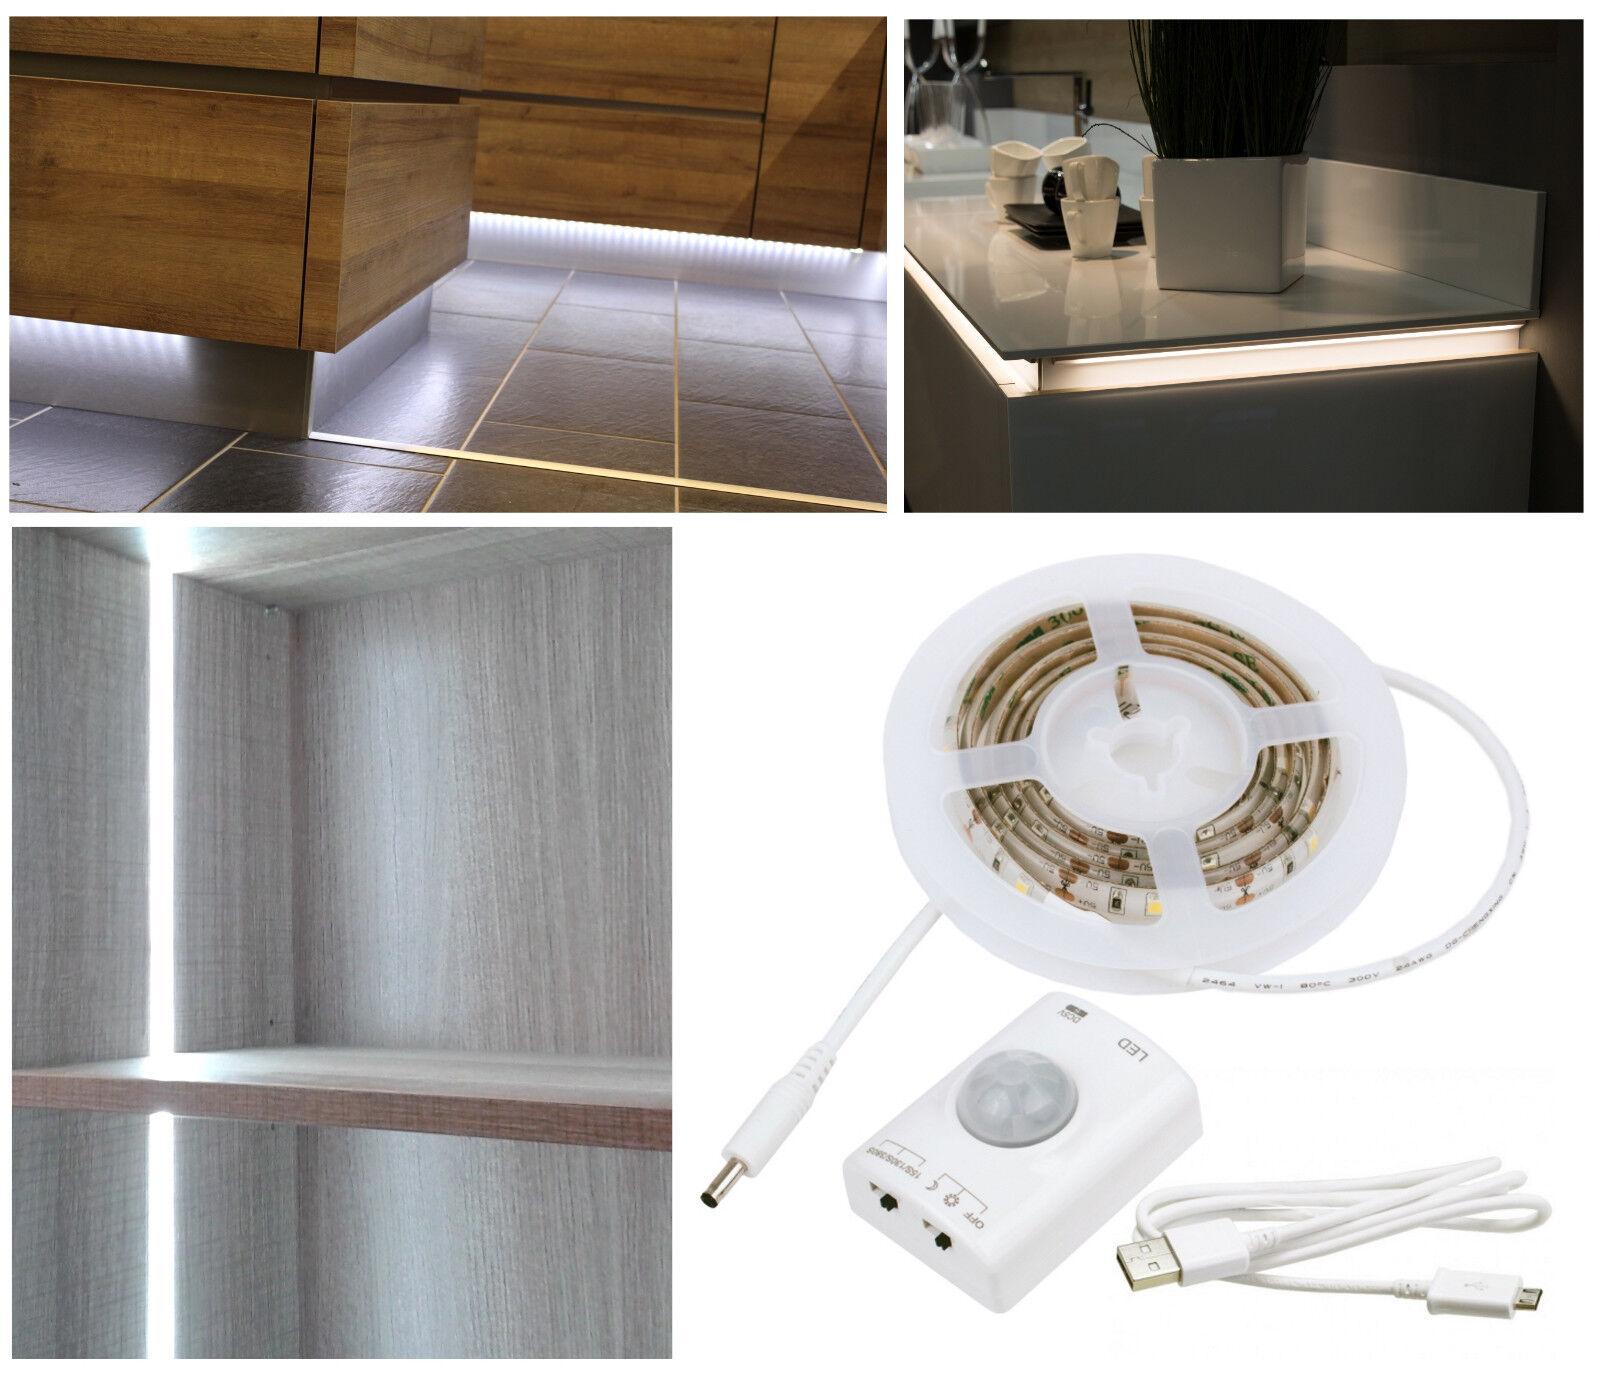 schrankbeleuchtung mehr als 200 angebote fotos preise. Black Bedroom Furniture Sets. Home Design Ideas